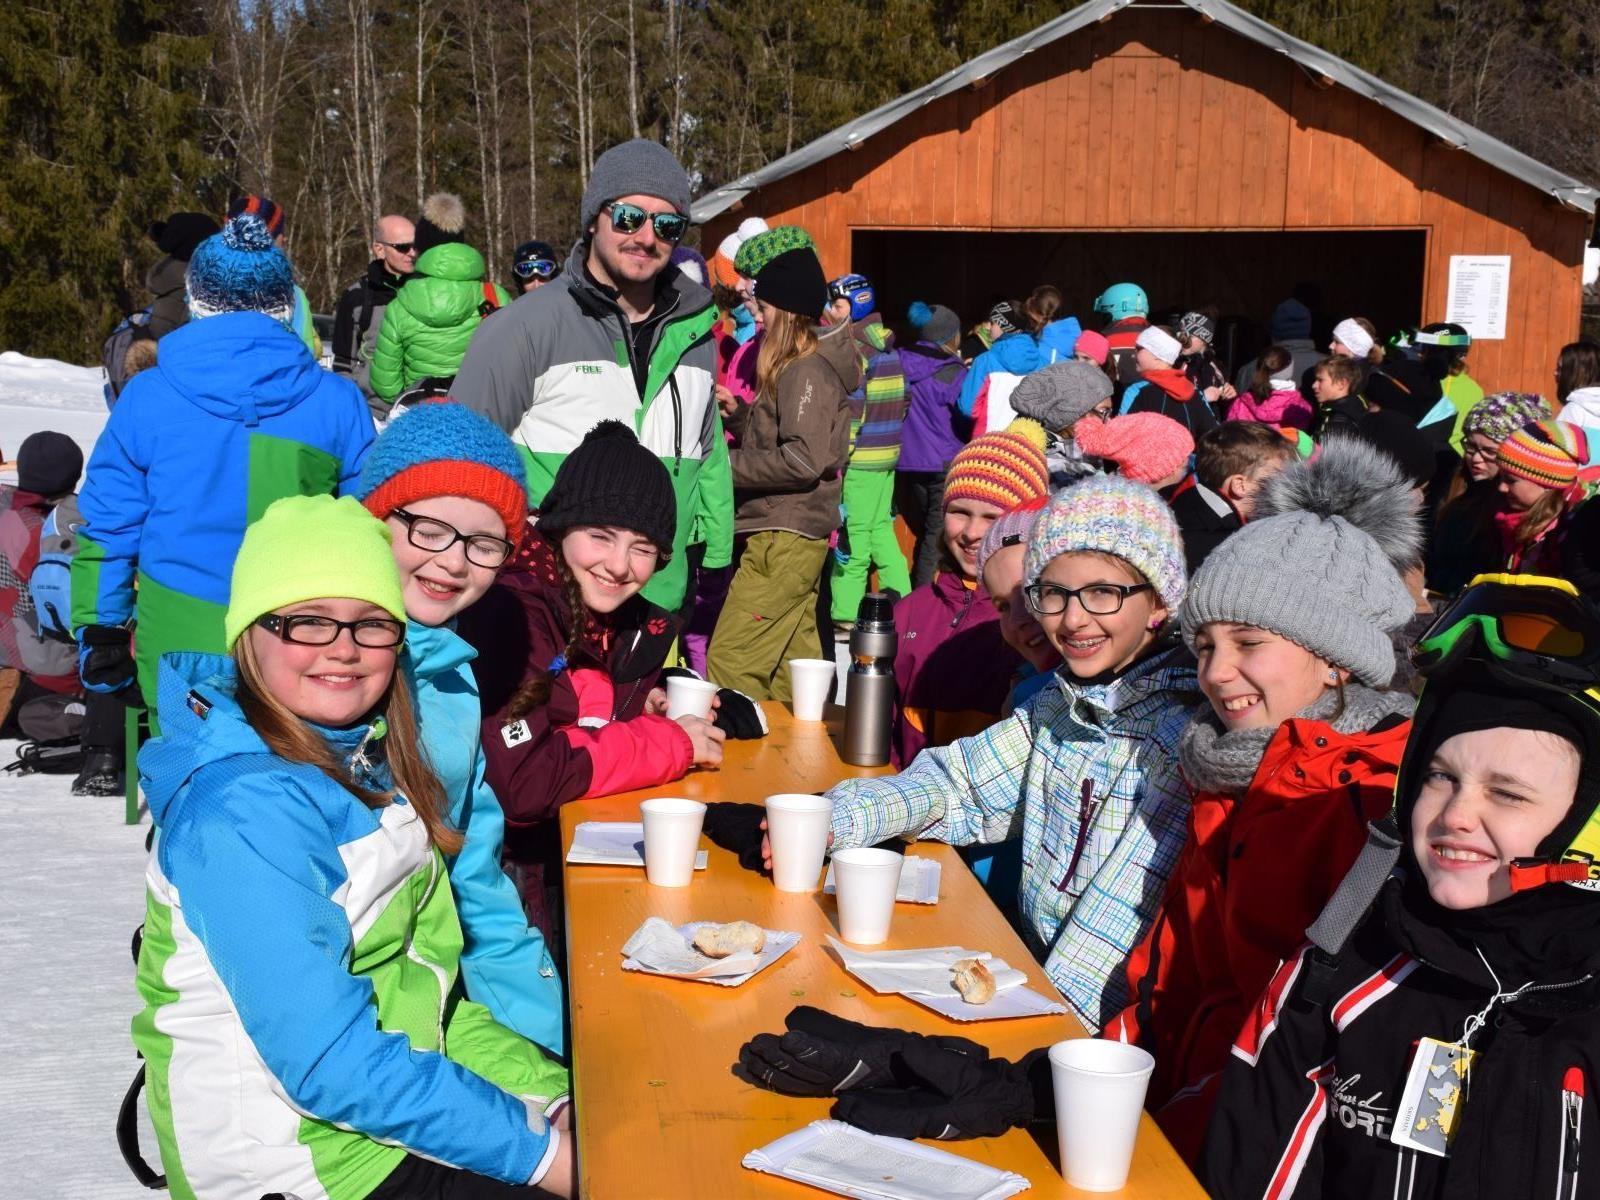 Wintersportag in Sibratsgfäll